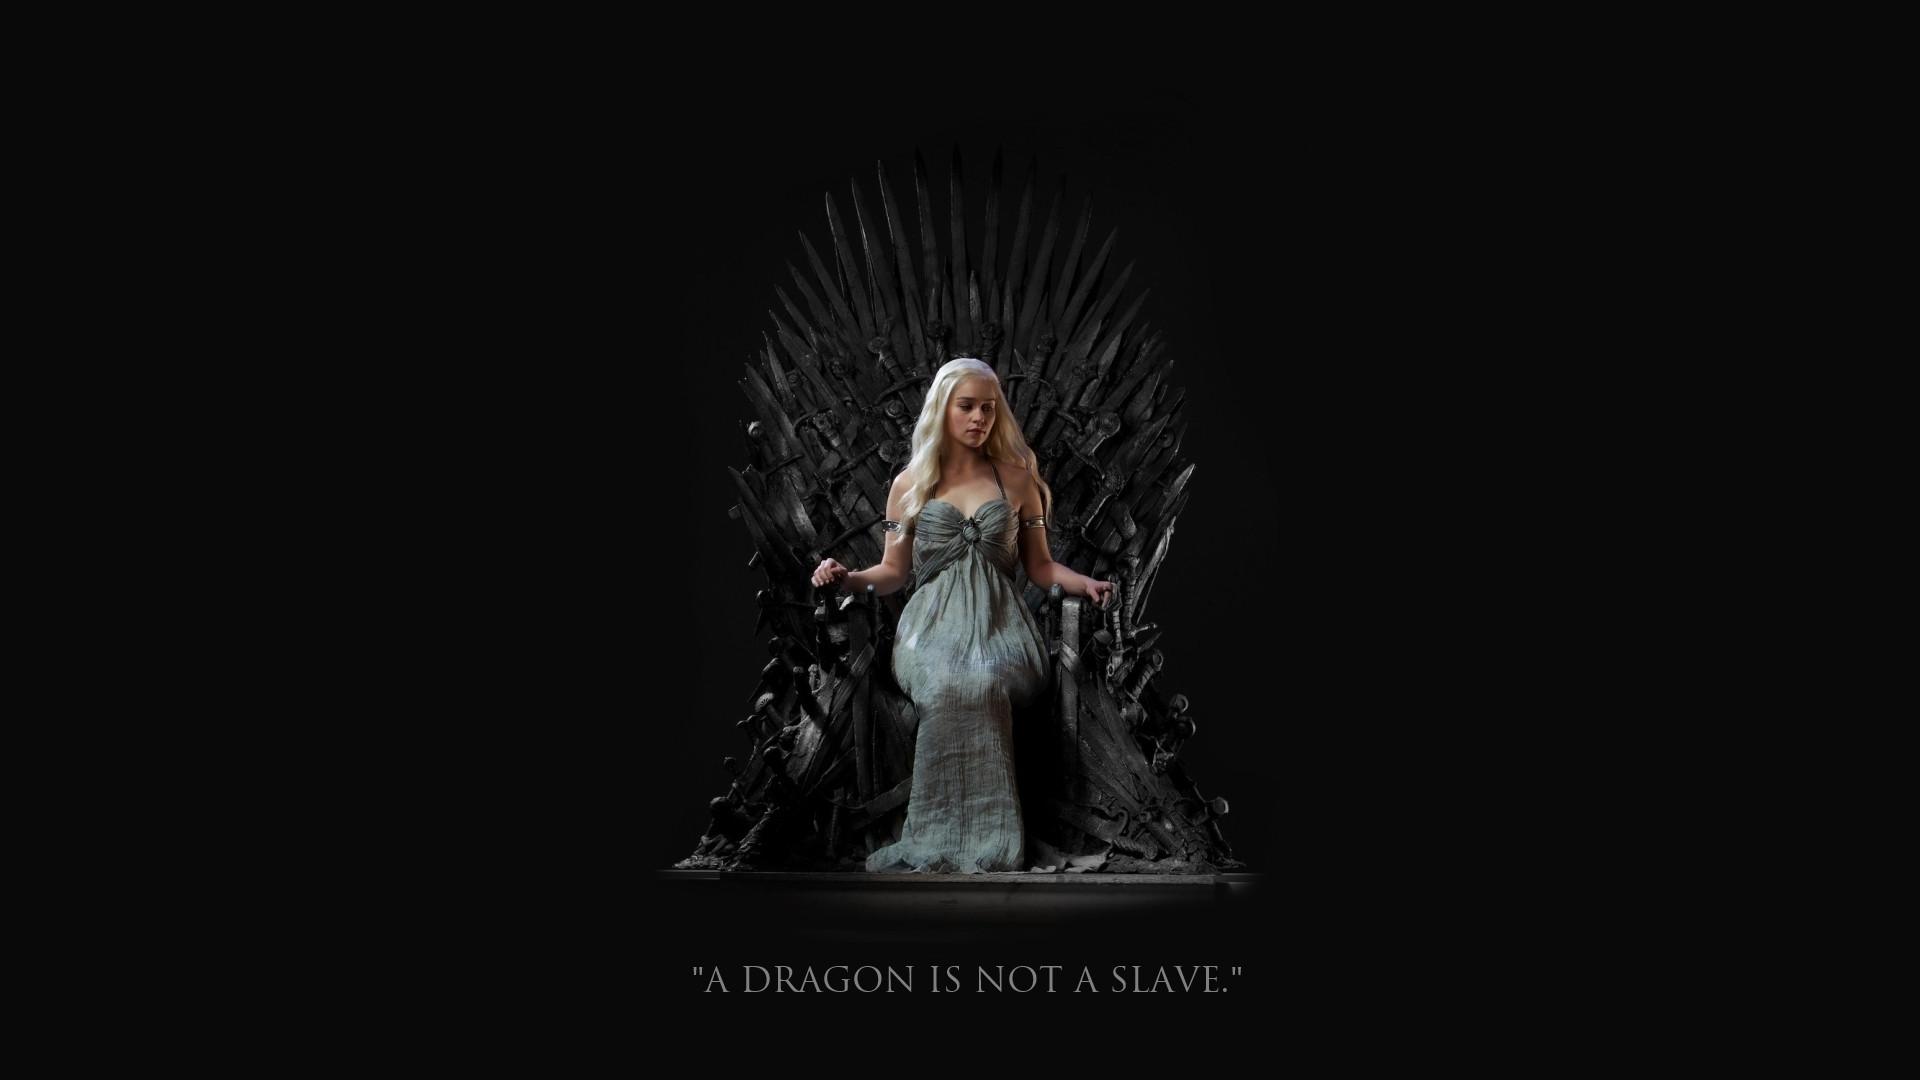 Game of Thrones fantasy dragon wallpaper 1920x1080 218932 1920x1080